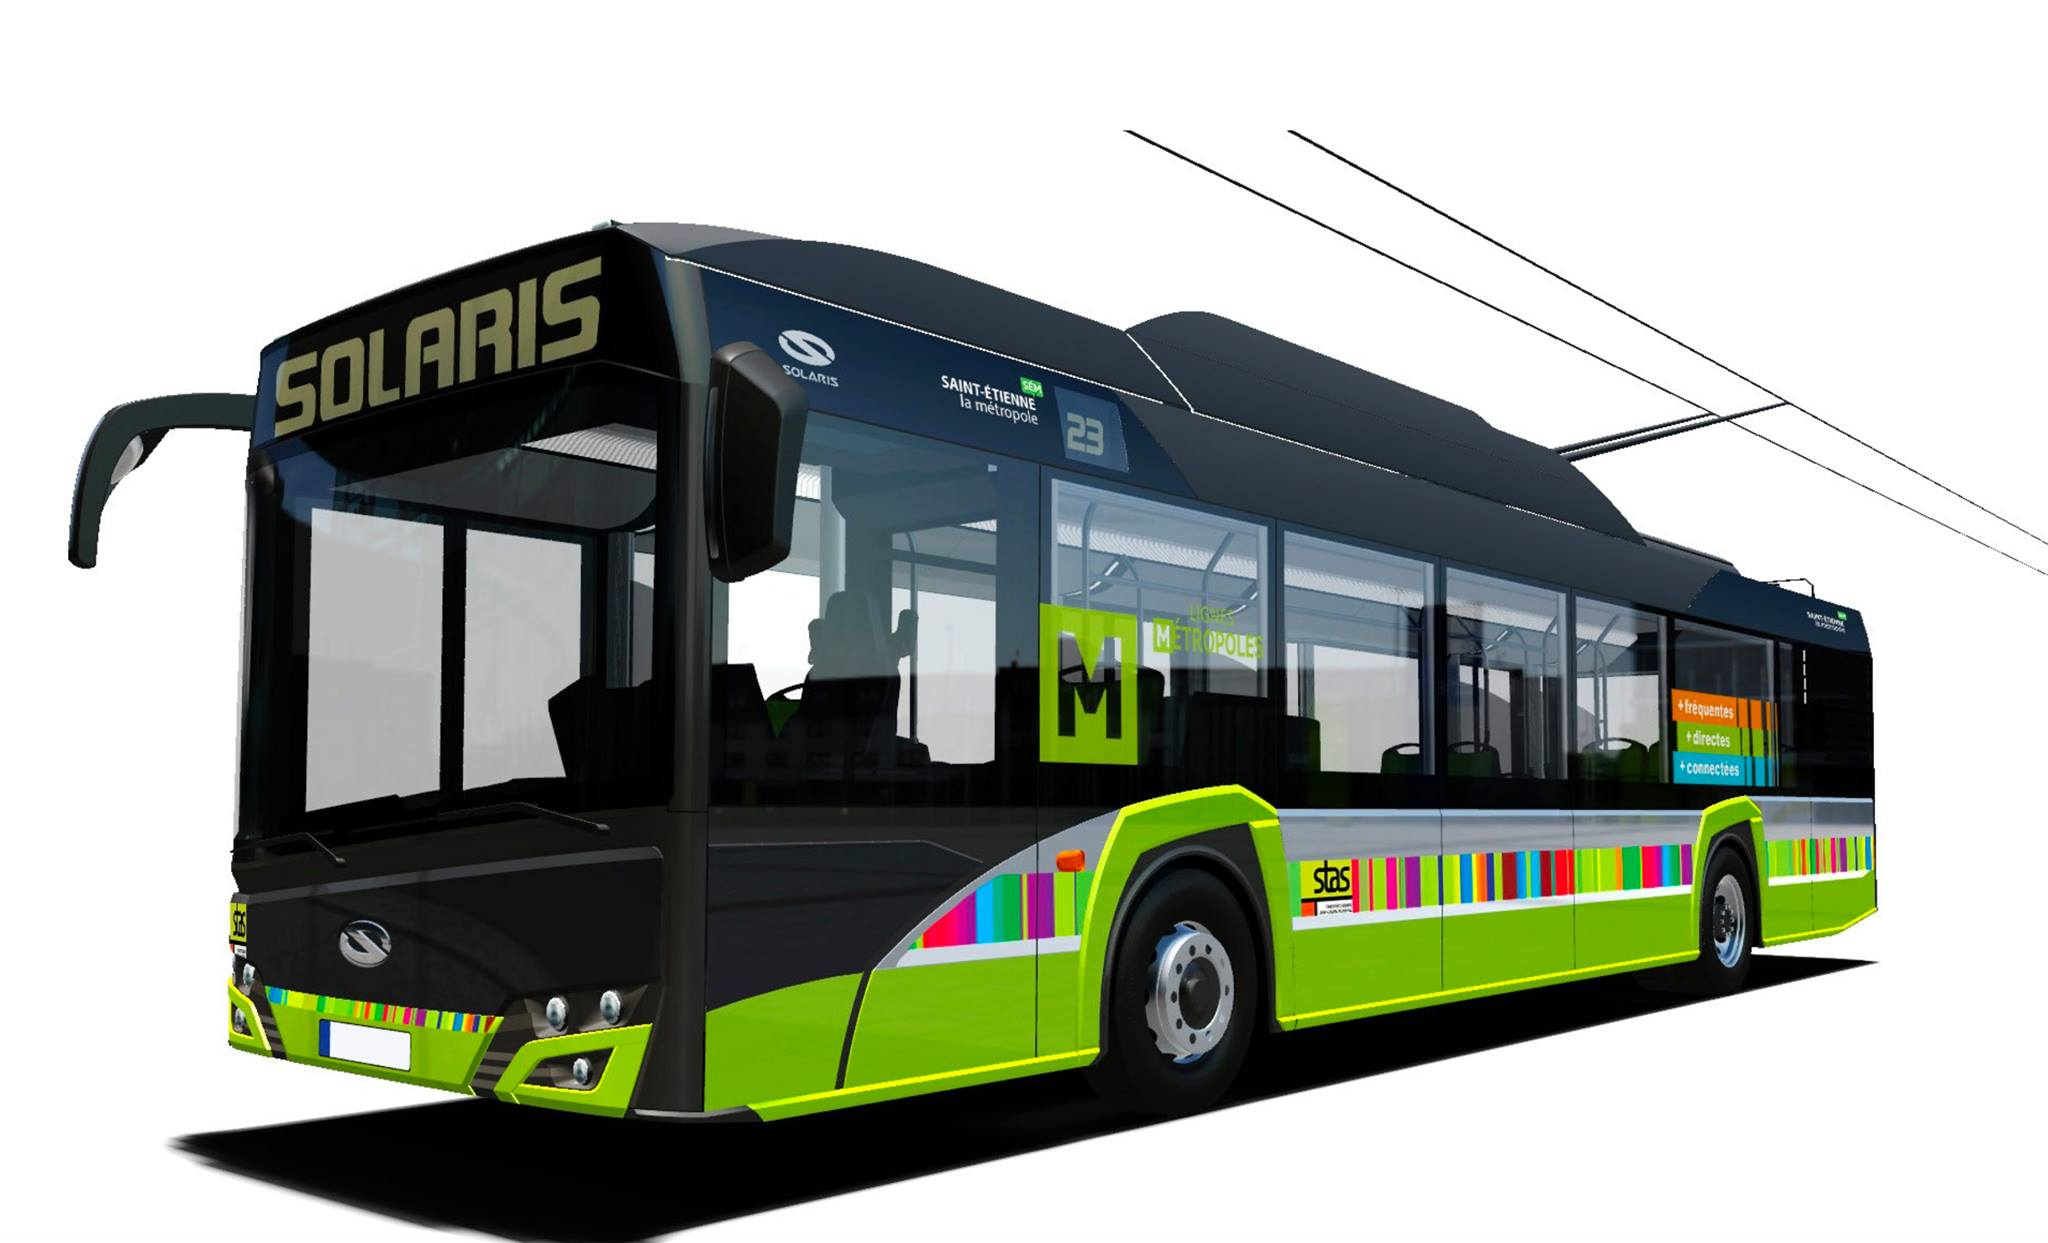 Nový trolejbus typu Trollino 12. (zdroj: Saint-Étienne Métropole)